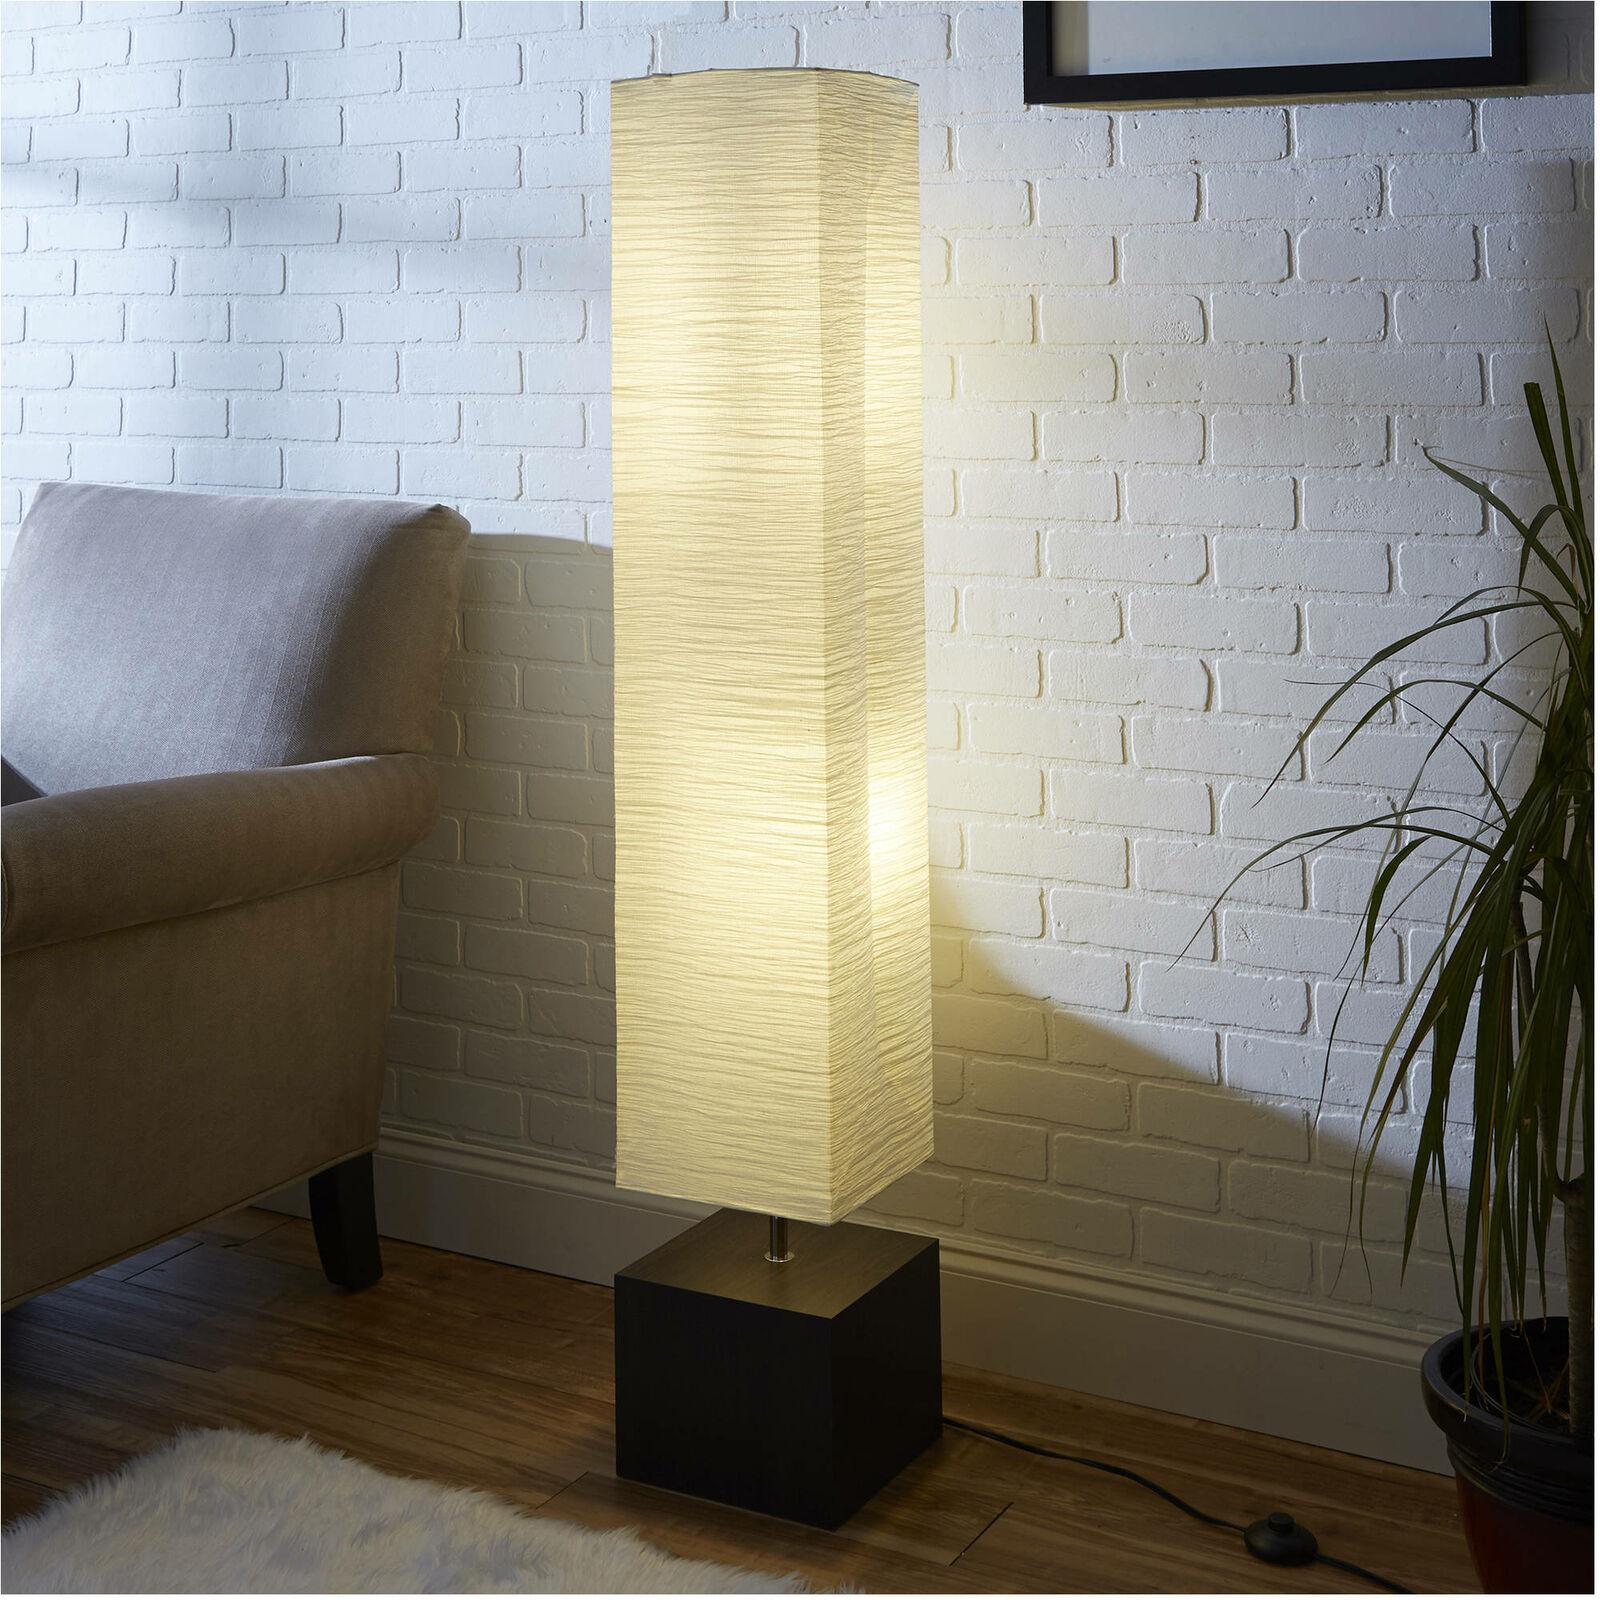 MAGNARP natural, Floor lamp IKEA